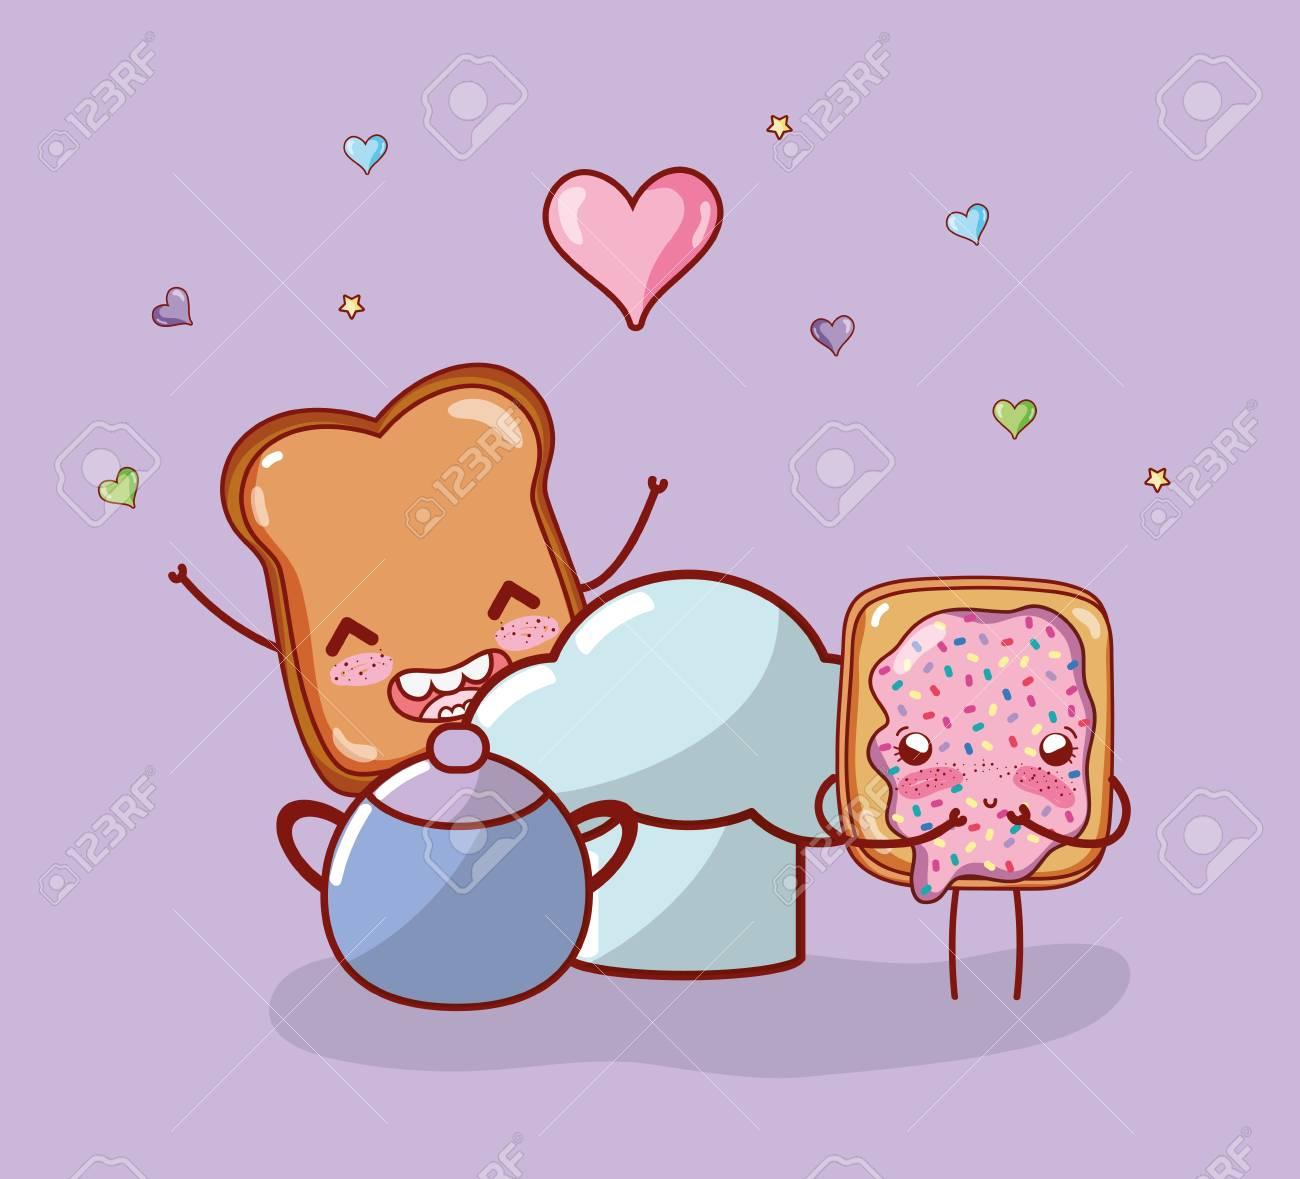 Kitchen Items Cartoon Kawaii Cartoon Stock Photo Picture And Royalty Free Image Image 110511840